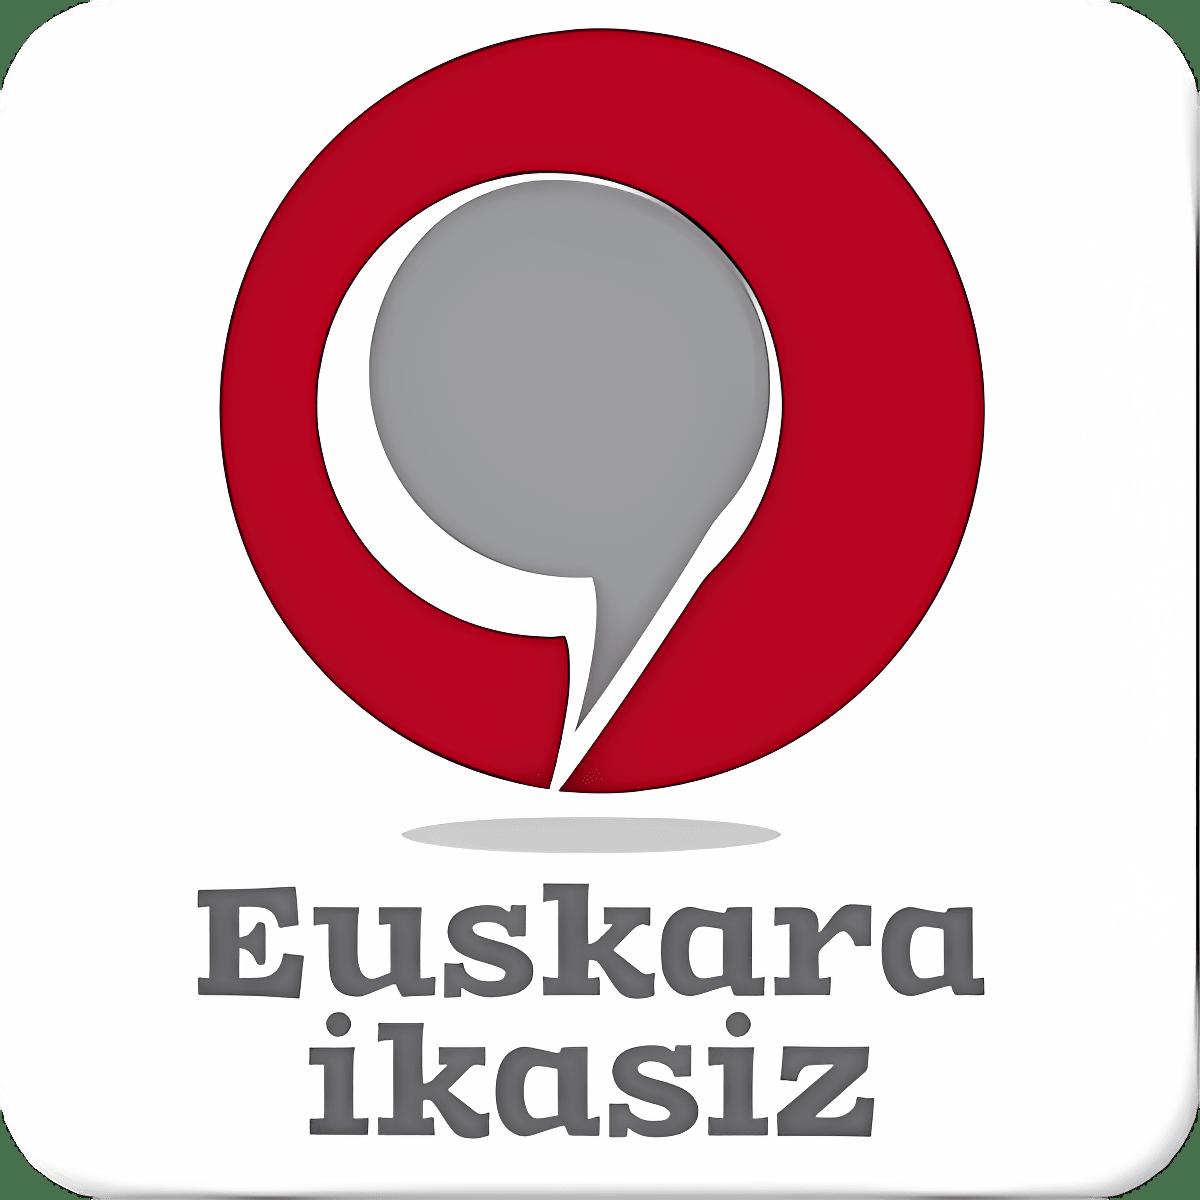 Euskara ikasiz 2.maila 1.2